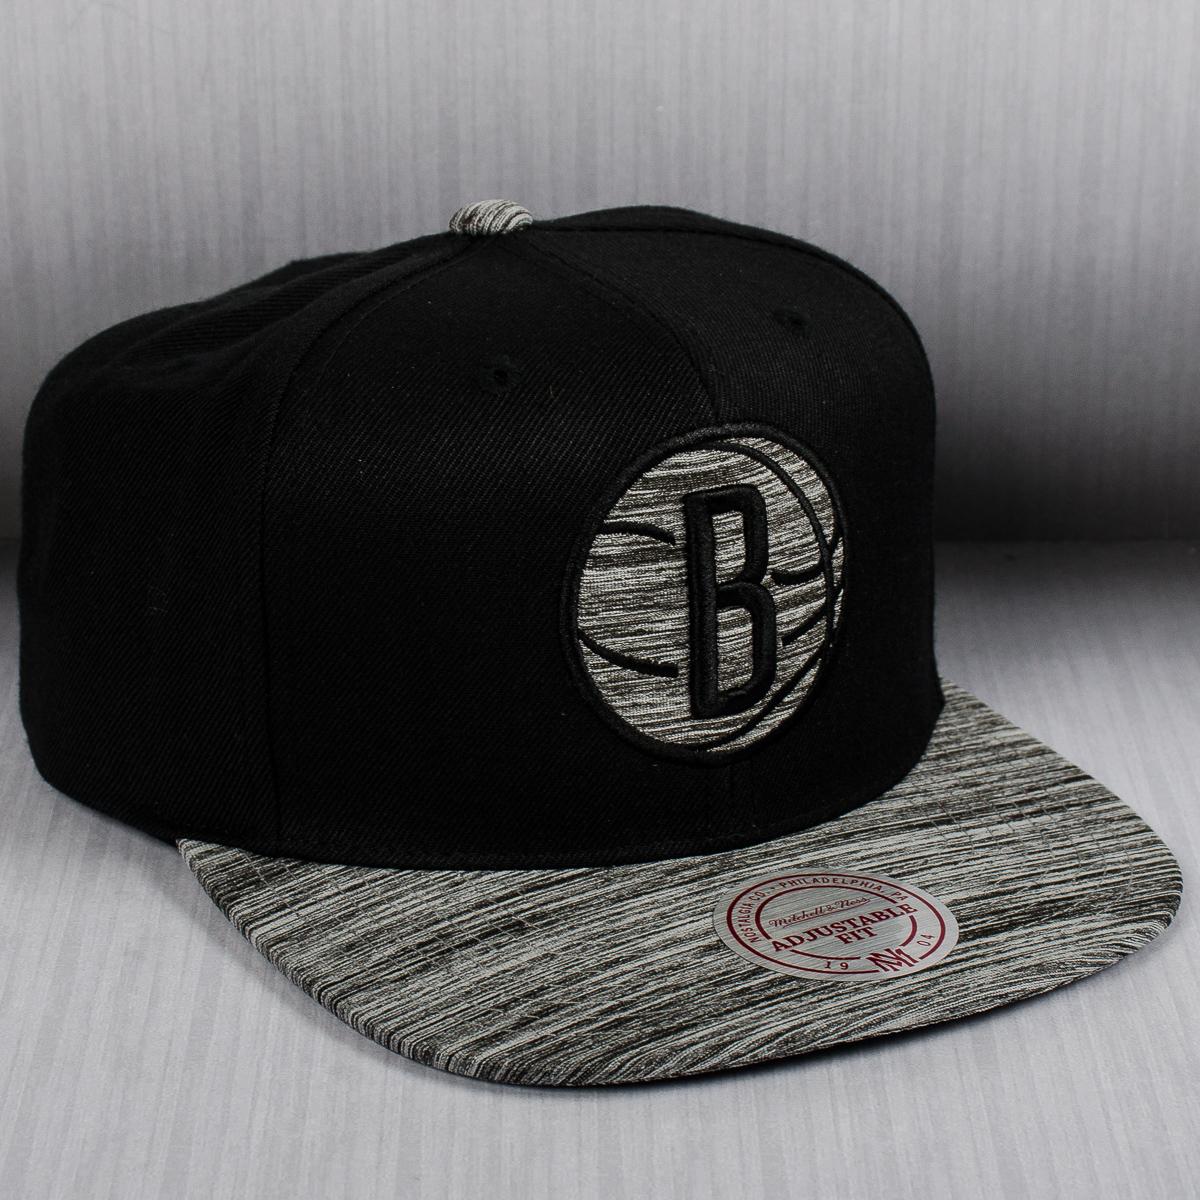 sale retailer 019bf 2934d Mitchell   Ness NBA Brooklyn Nets Motion Snapback Cap - NBA Shop Brooklyn  Nets Merchandise - Superfanas.lt